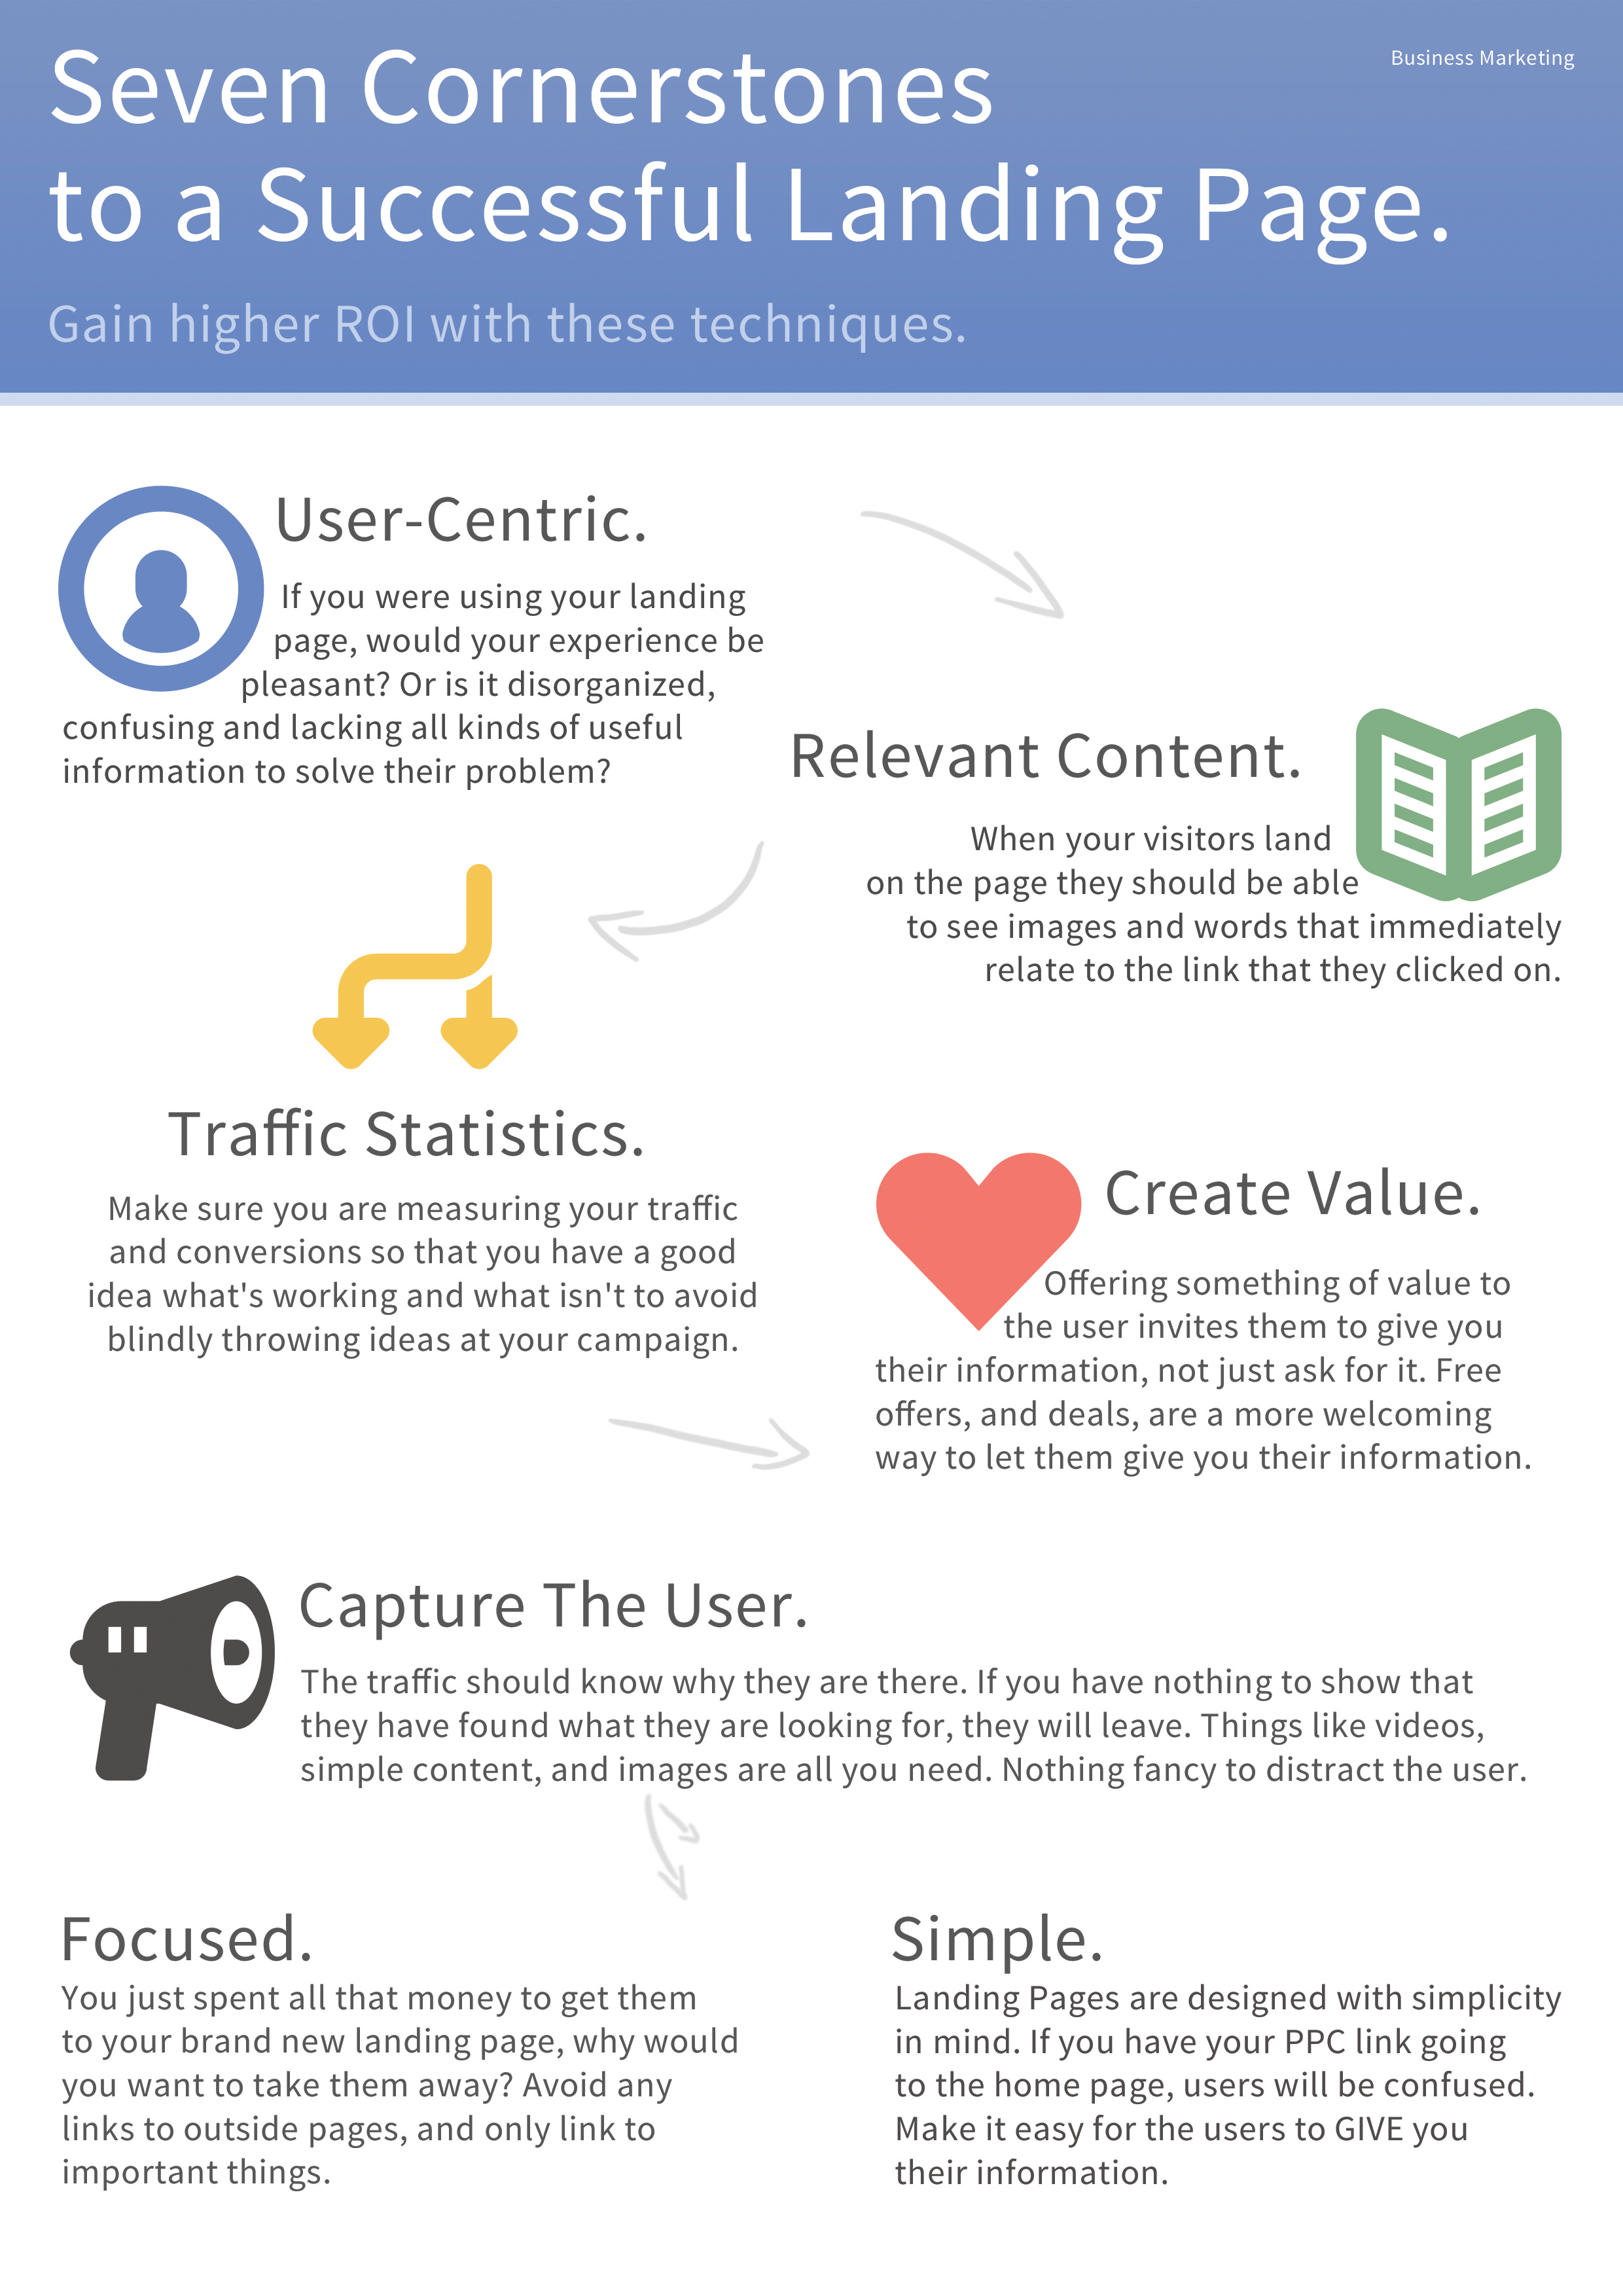 7 piedras angulares de una Landing Page #infografia #infographic #marketing